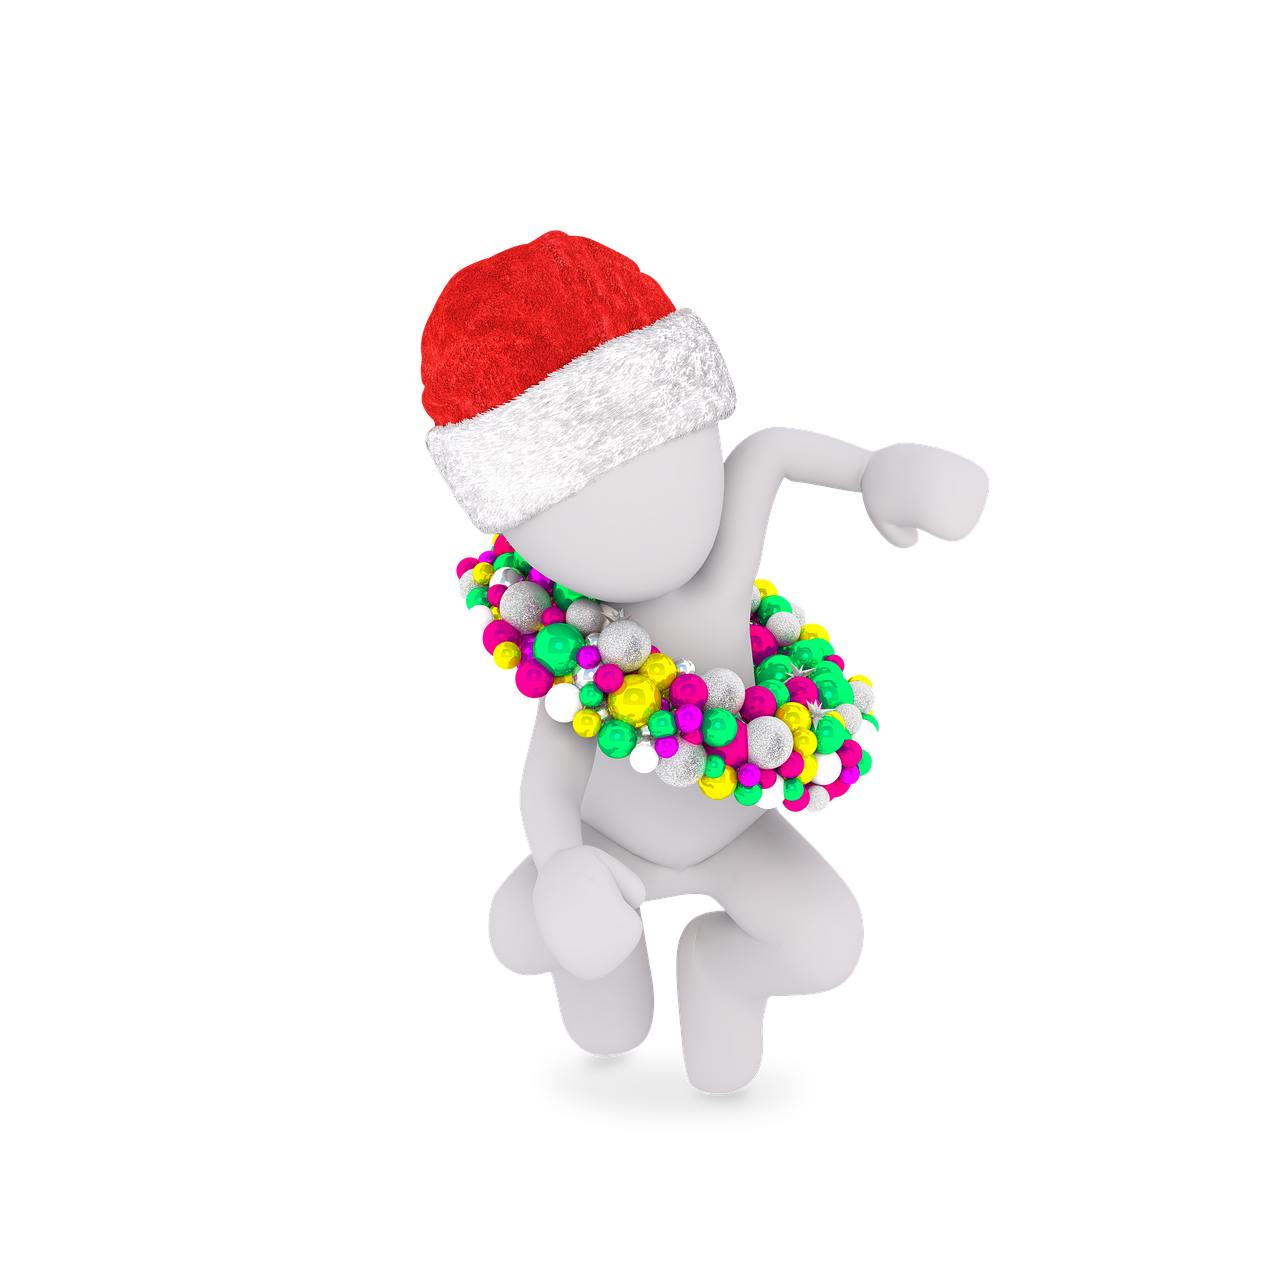 Christmas Wreath Dance Free Image On Pixabay